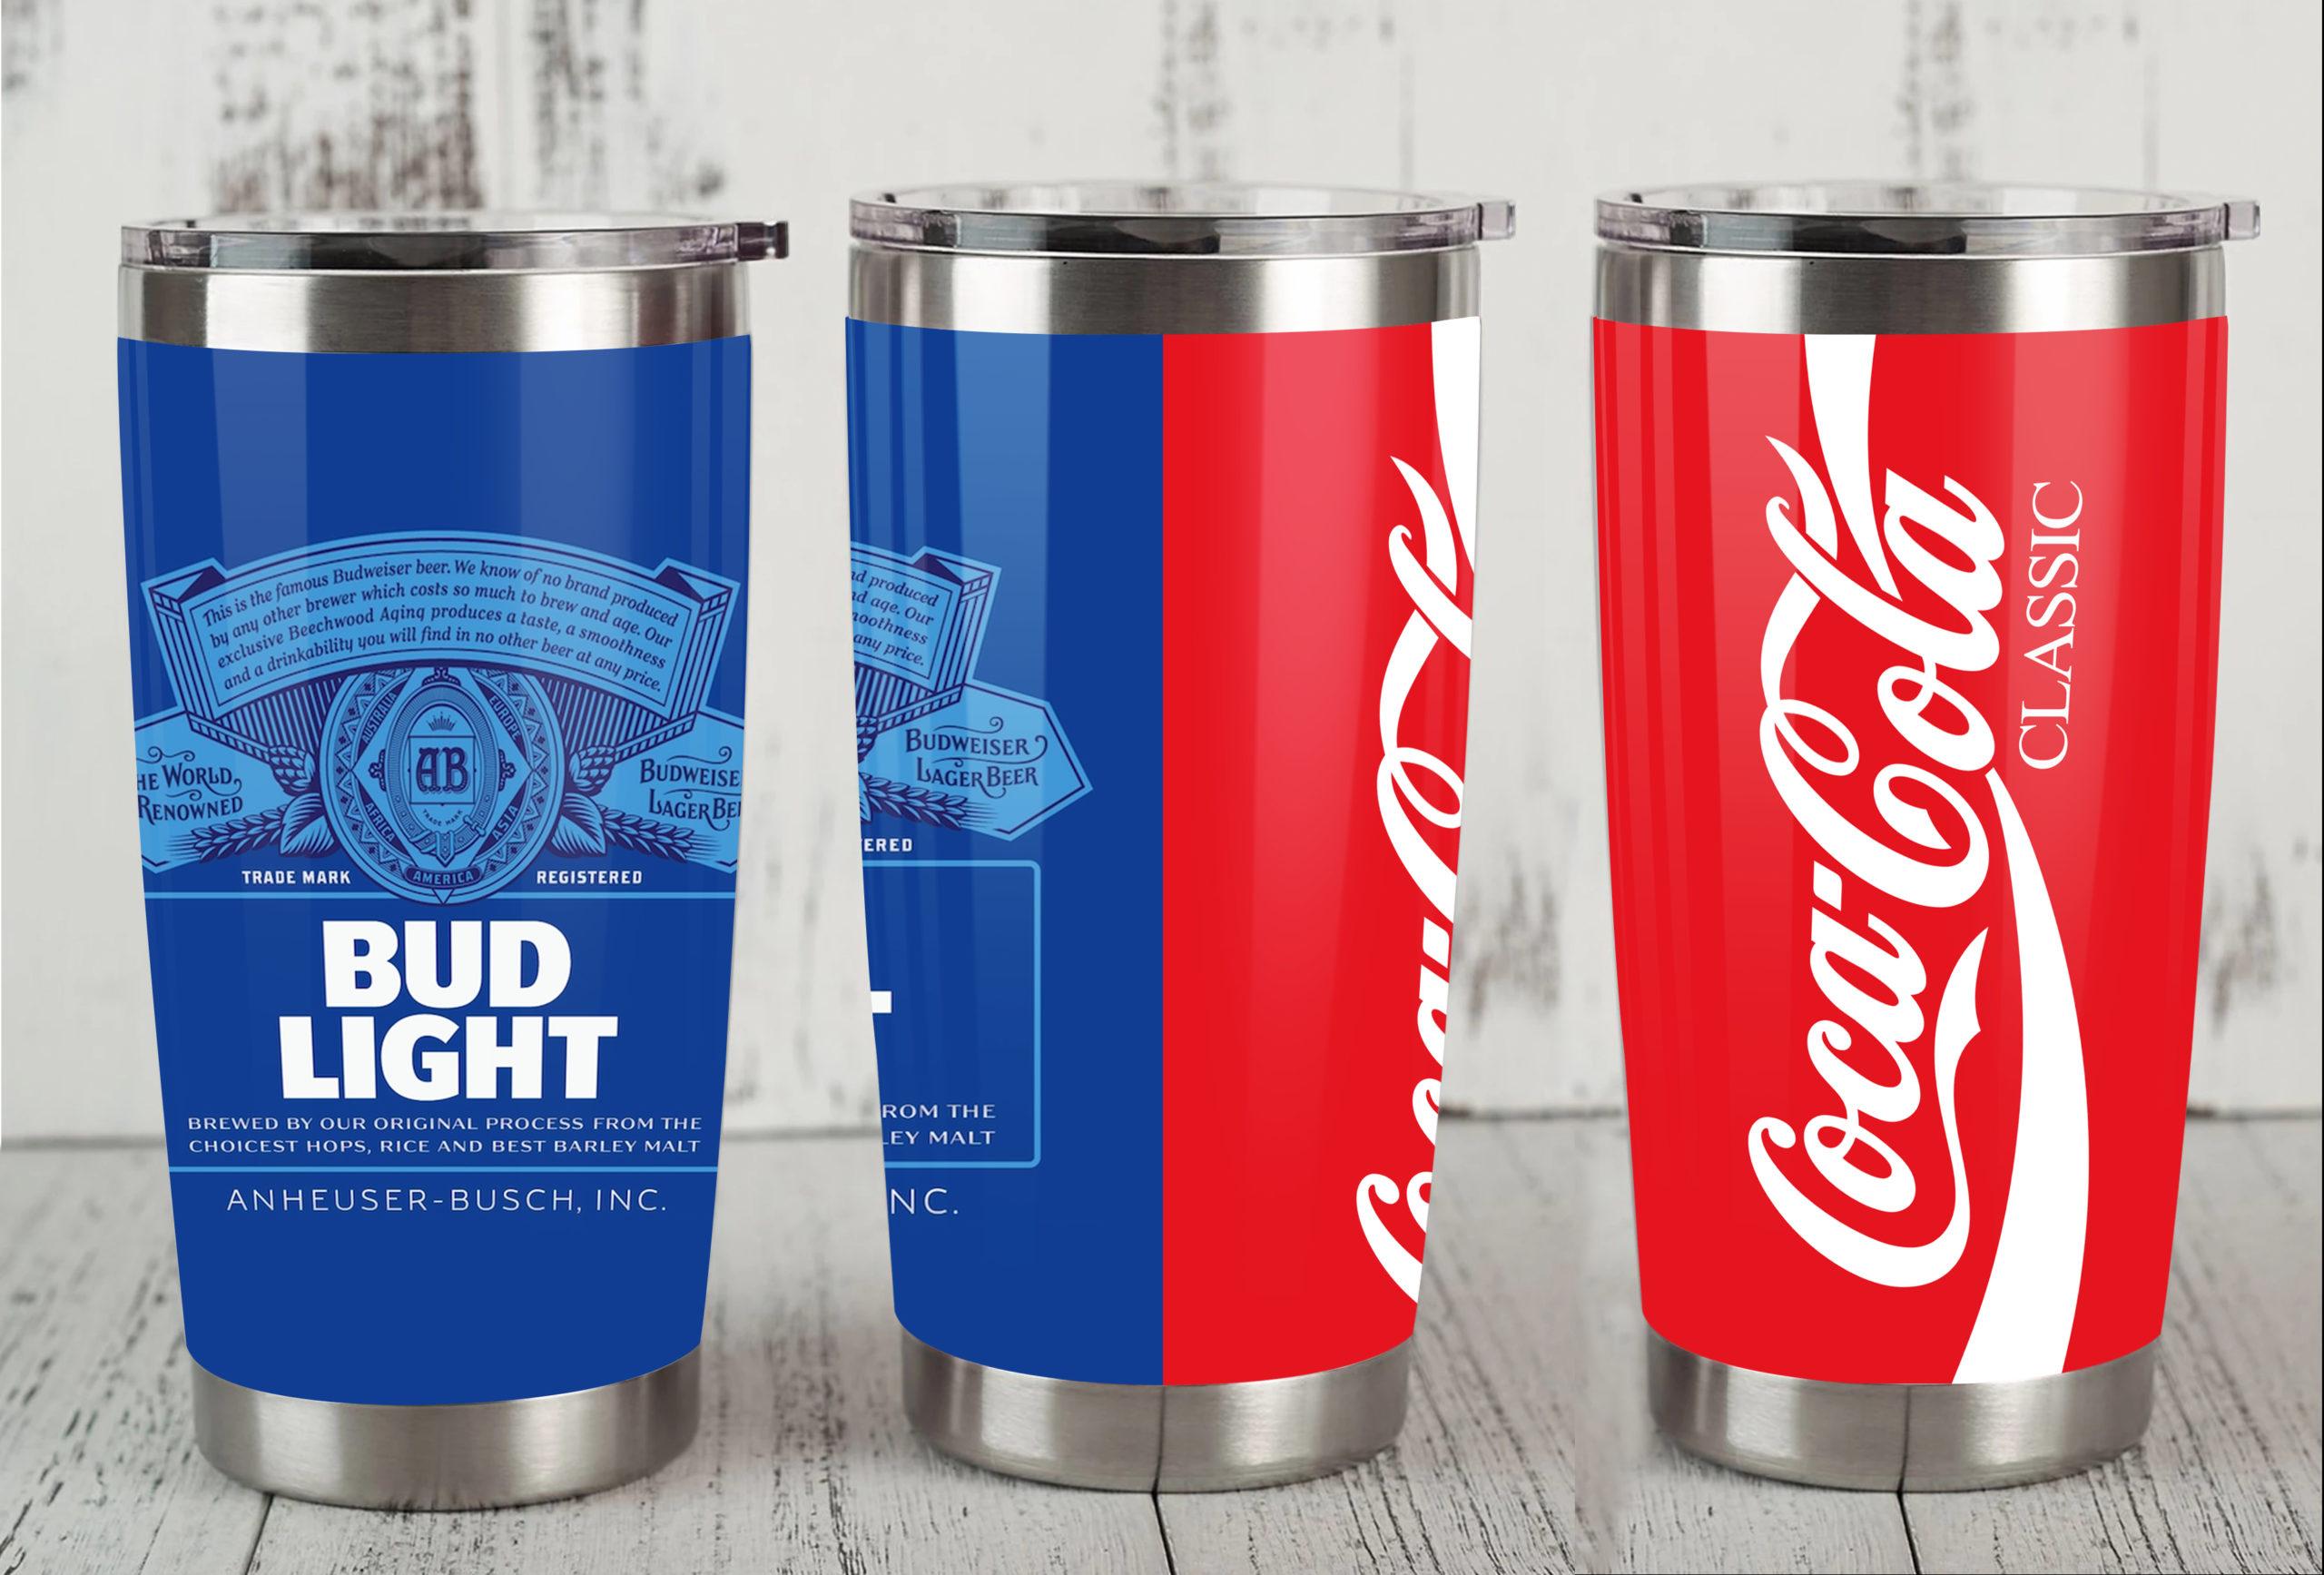 Bud light coca cola all over print tumbler 4